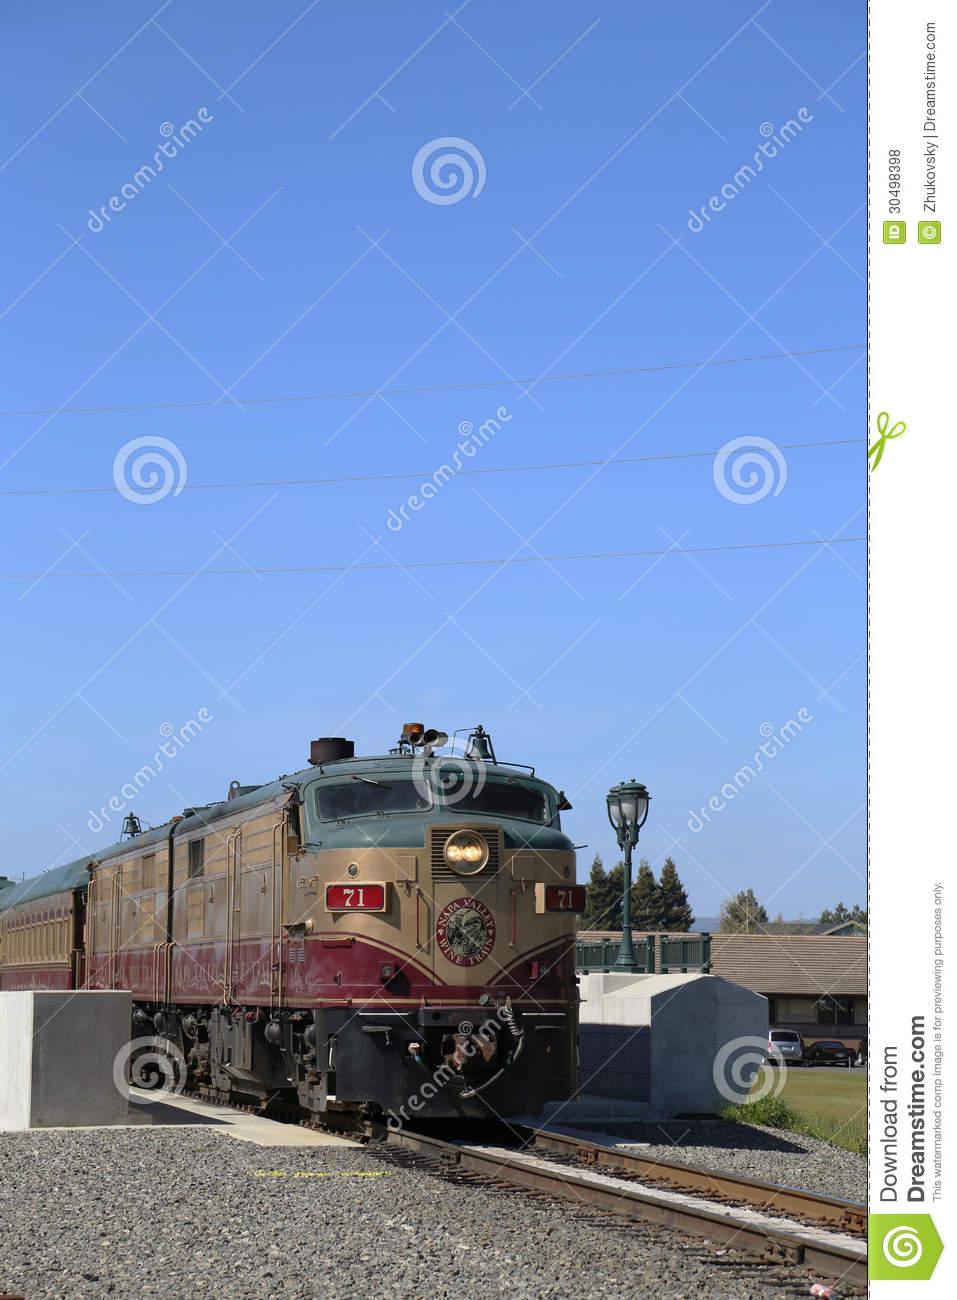 Valley Wine Train Napa Reviews Of Napa Valley HD Landscape Wallpaper 957x1300